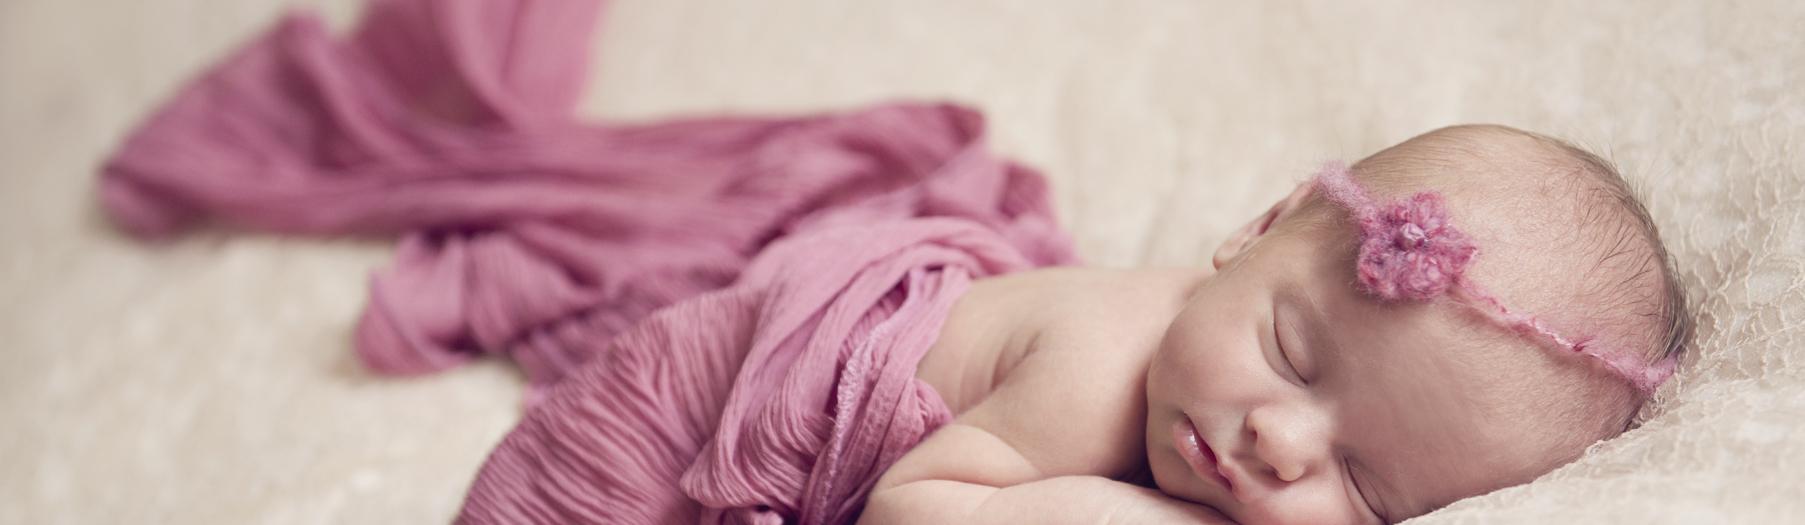 Principessina in miniatura